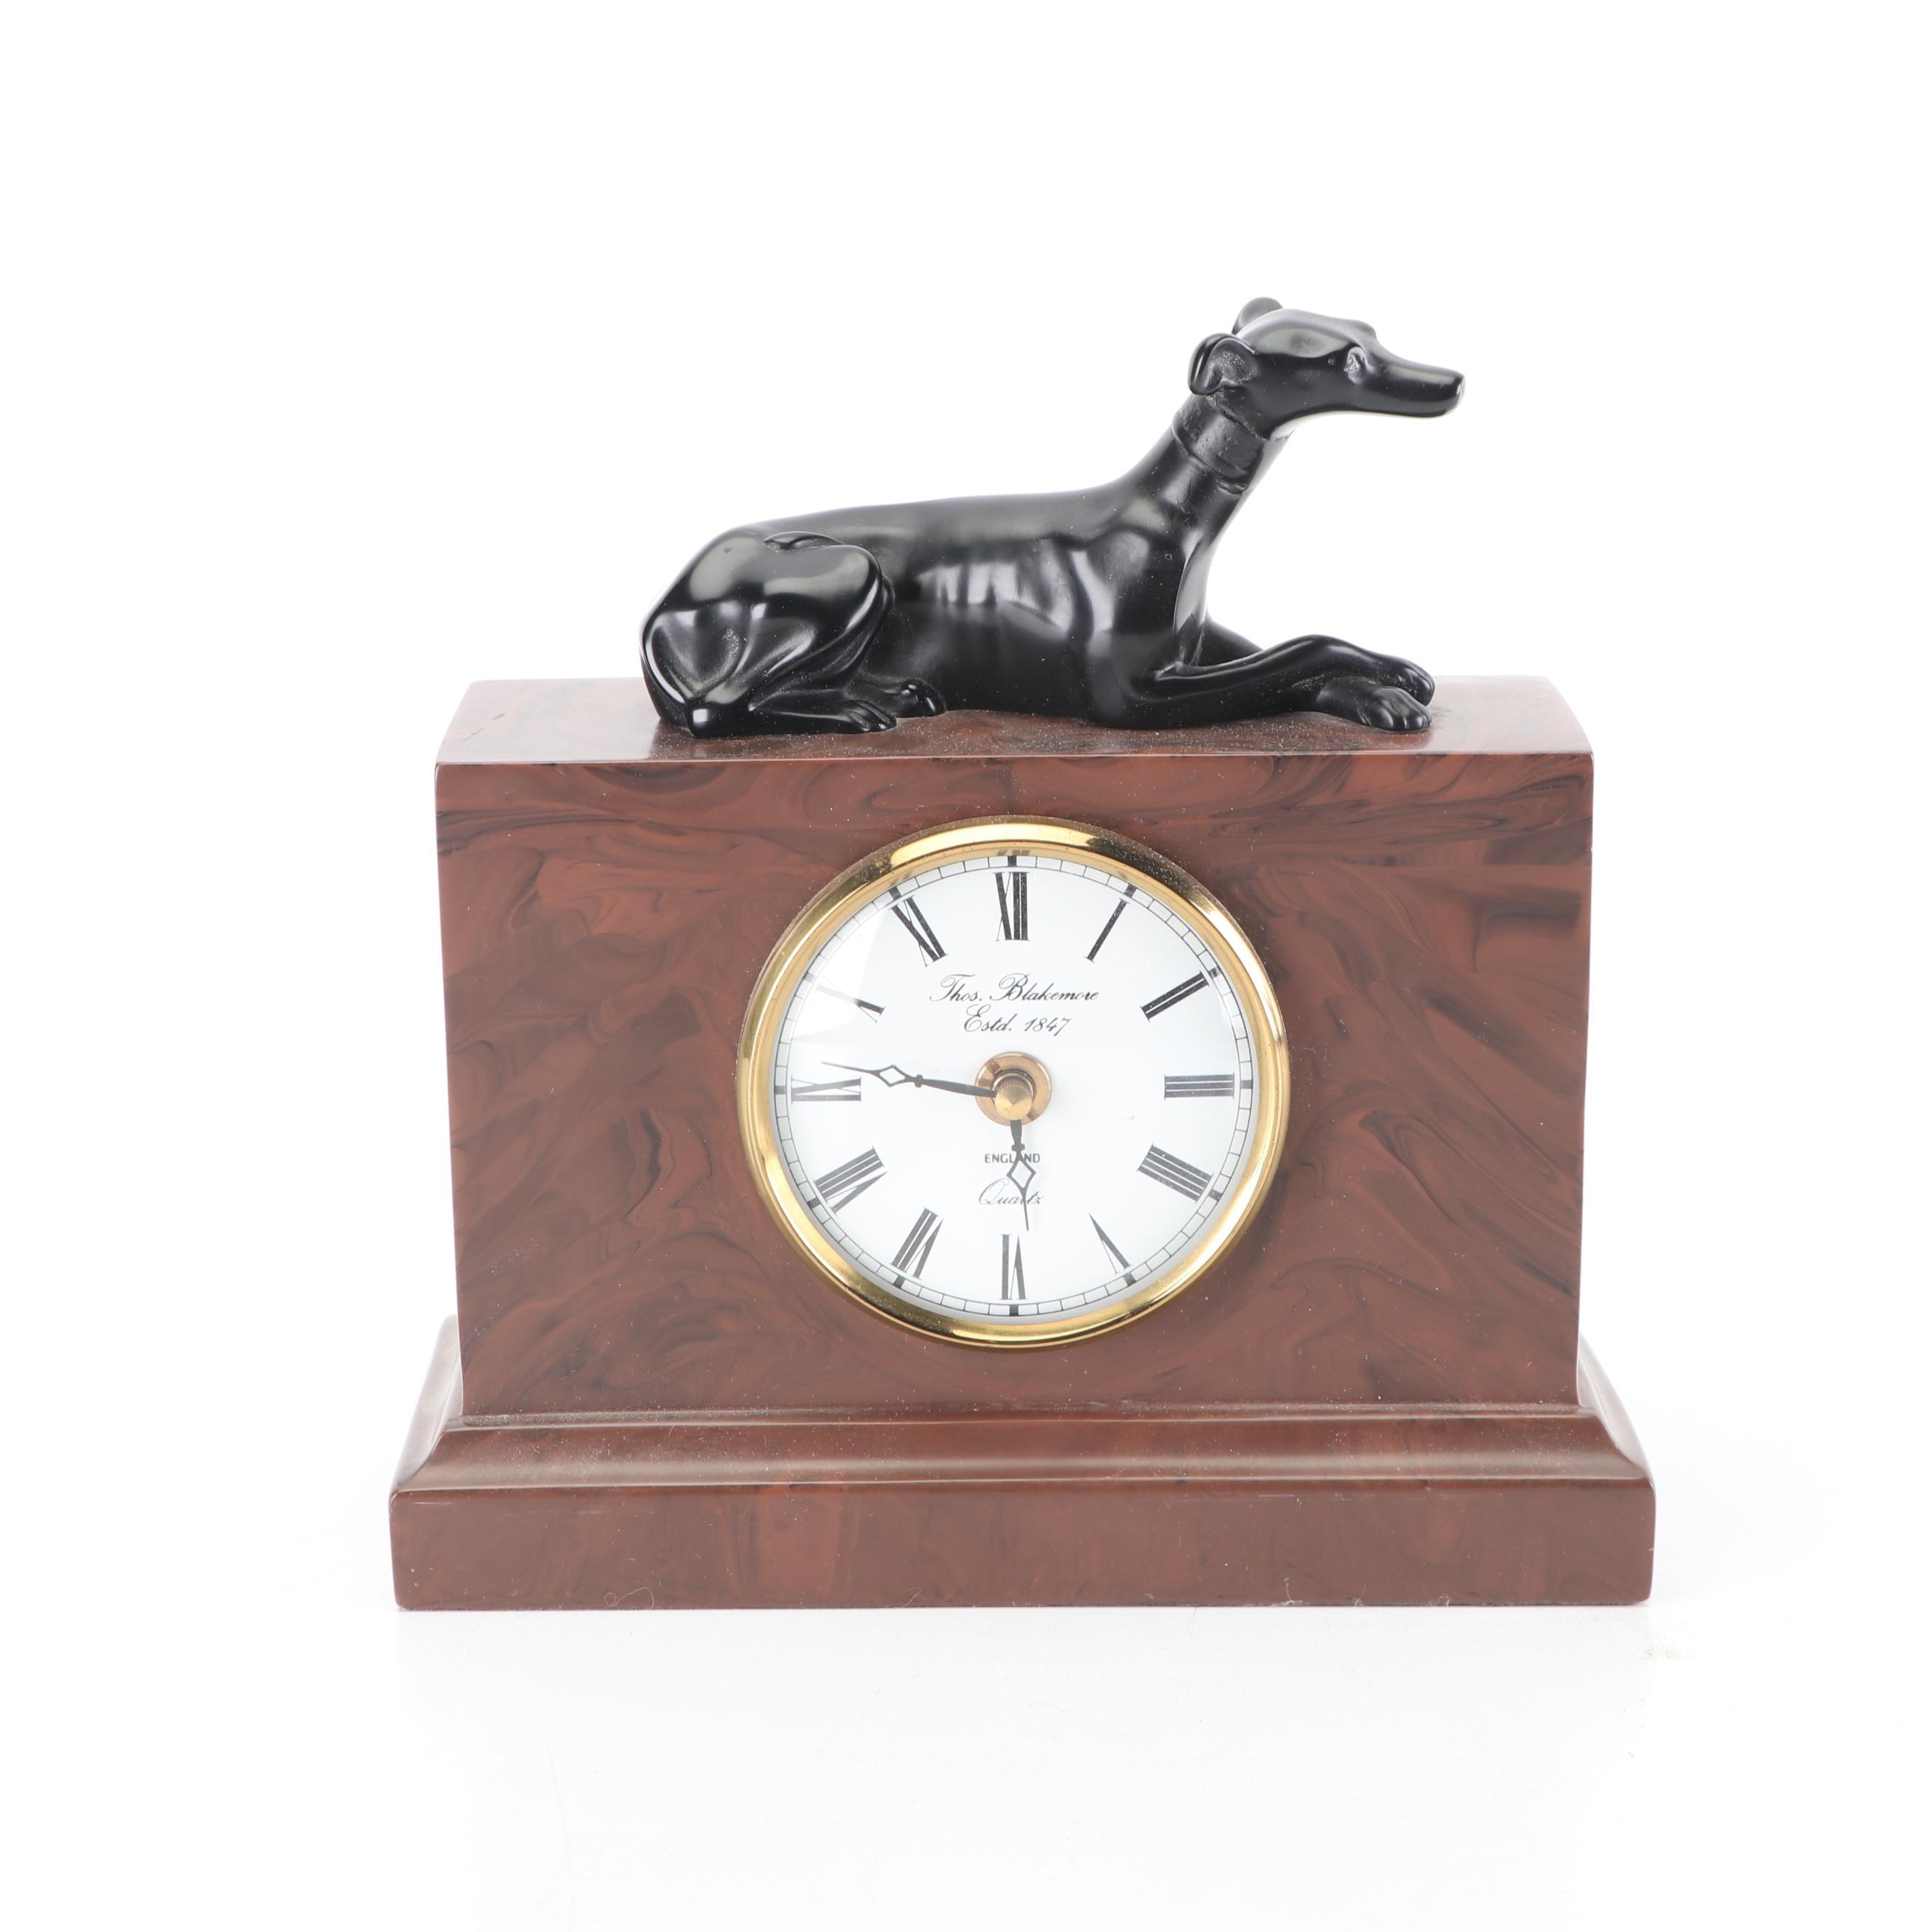 Thomas Blakemore English Mantel Clock with Figural Greyhound